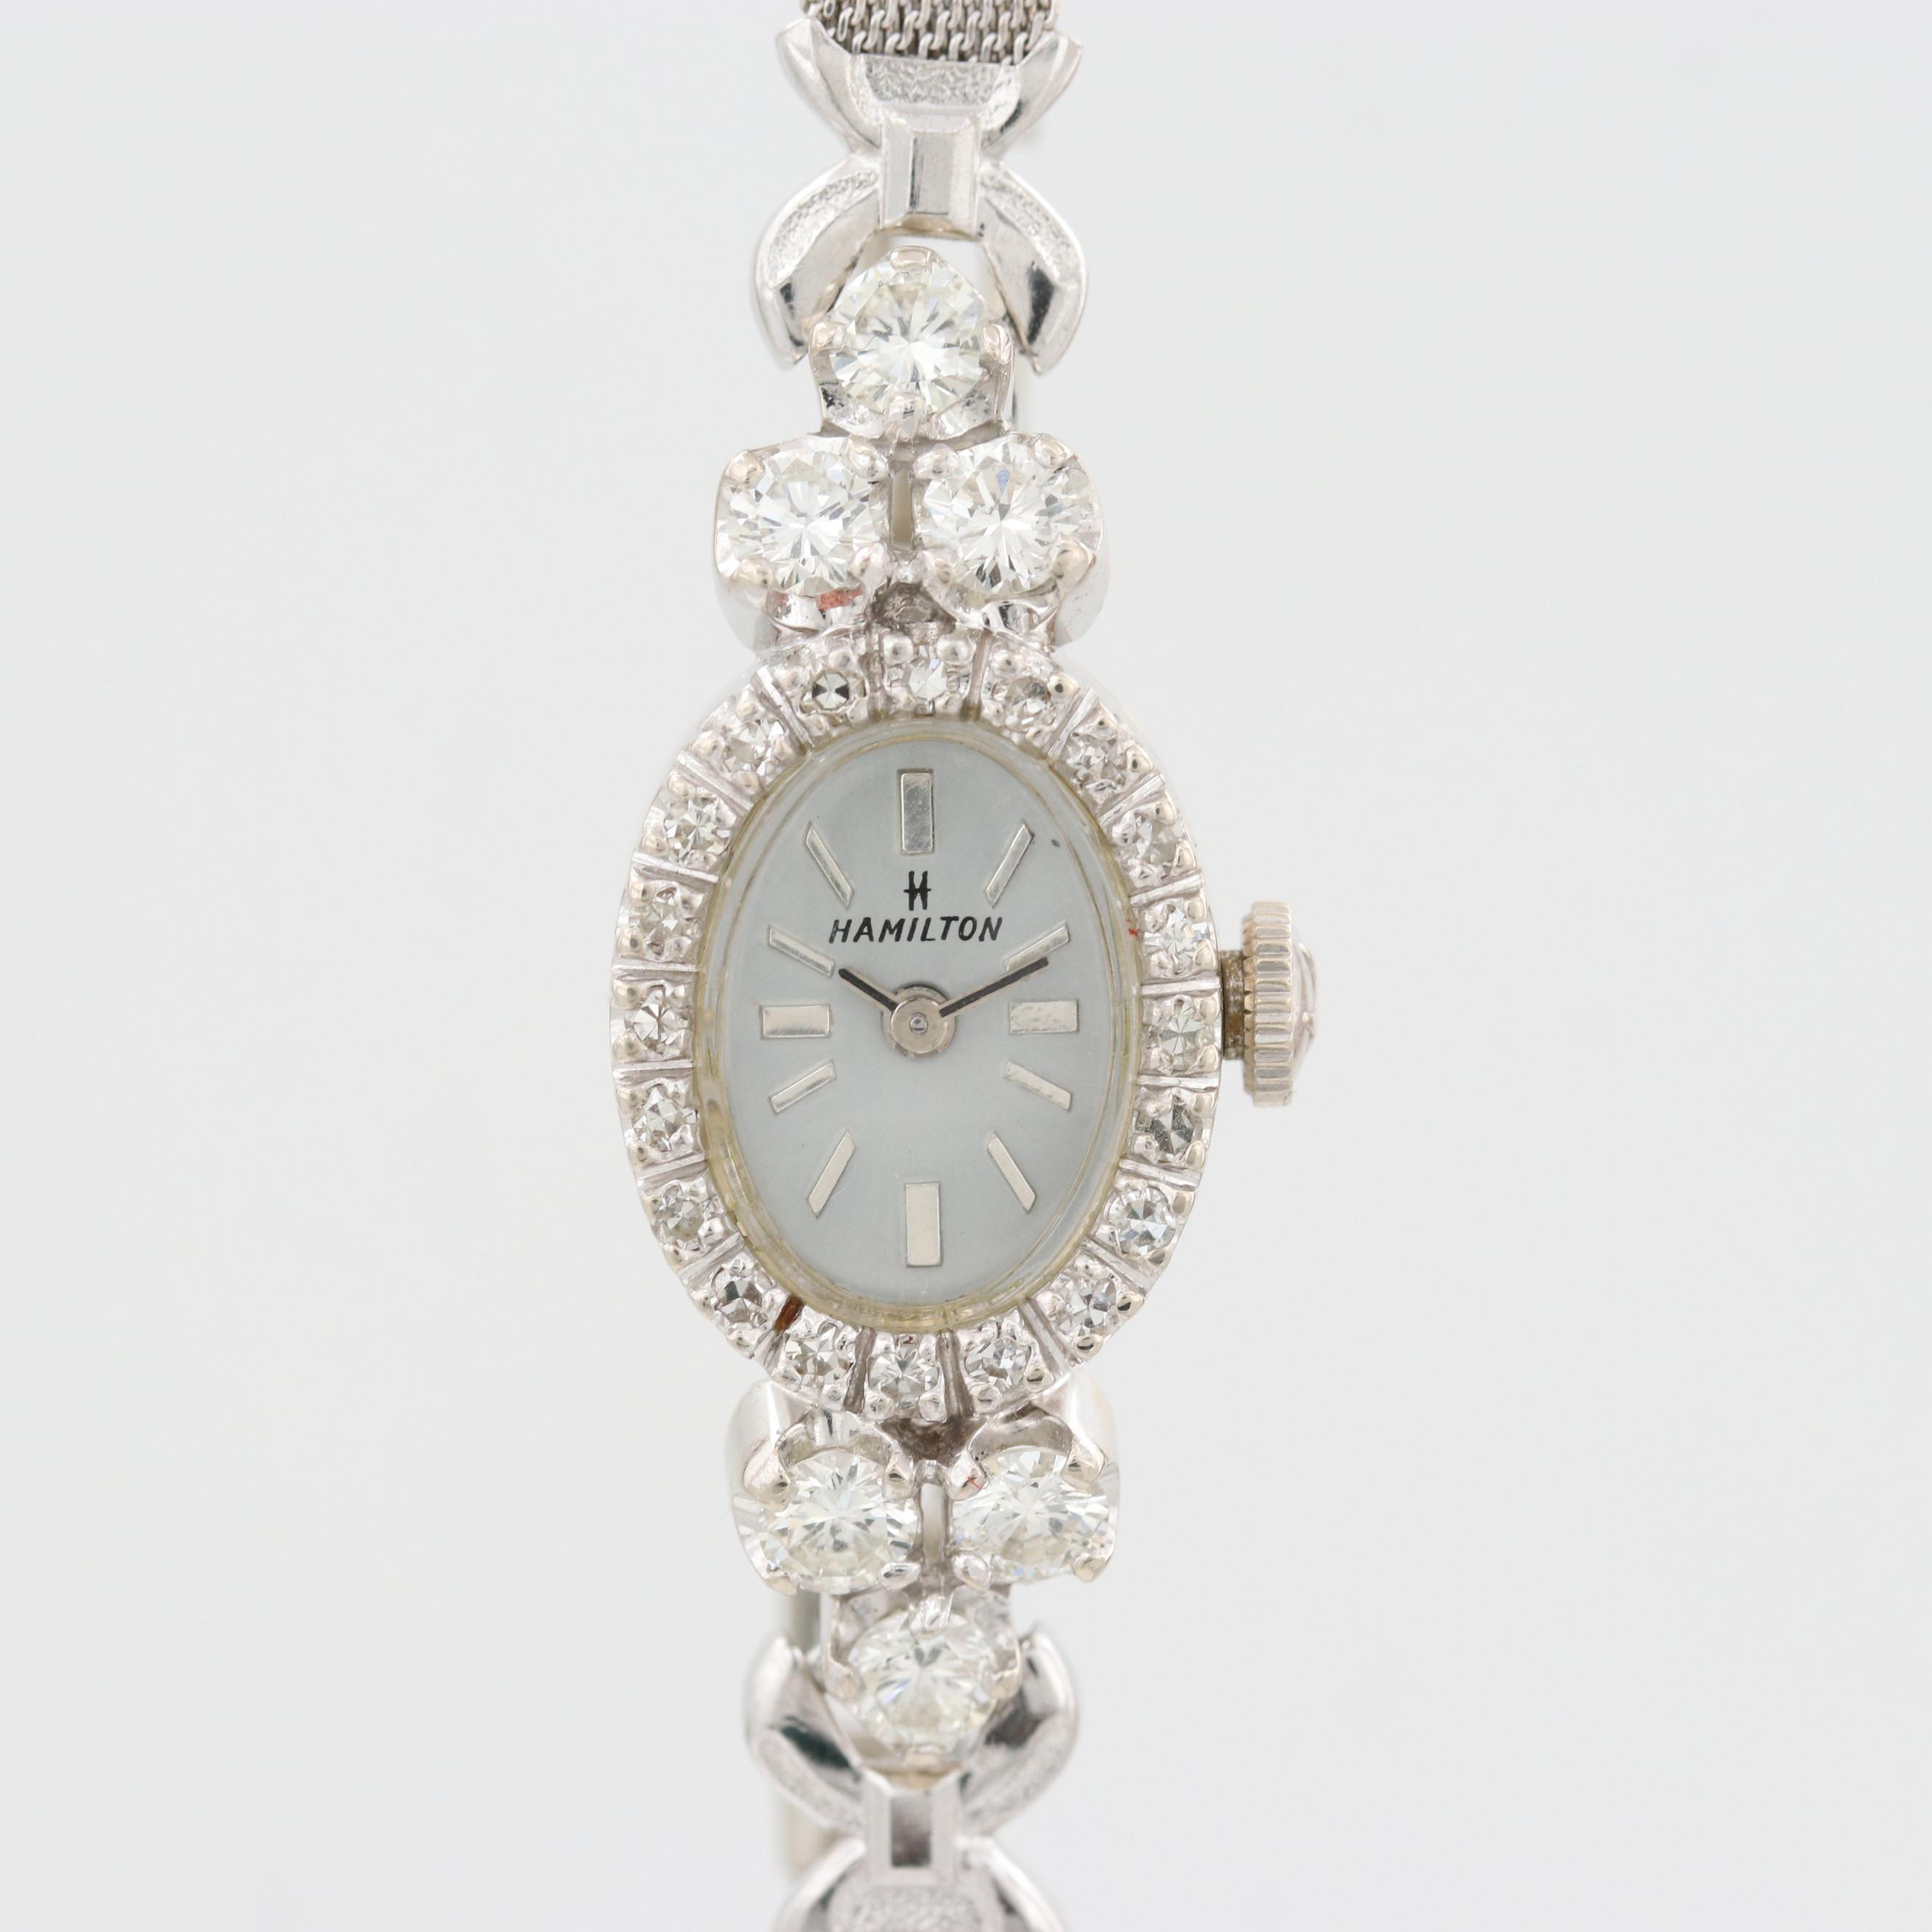 Hamilton 14K White Gold Wristwatch With 1.53 CTW Diamonds